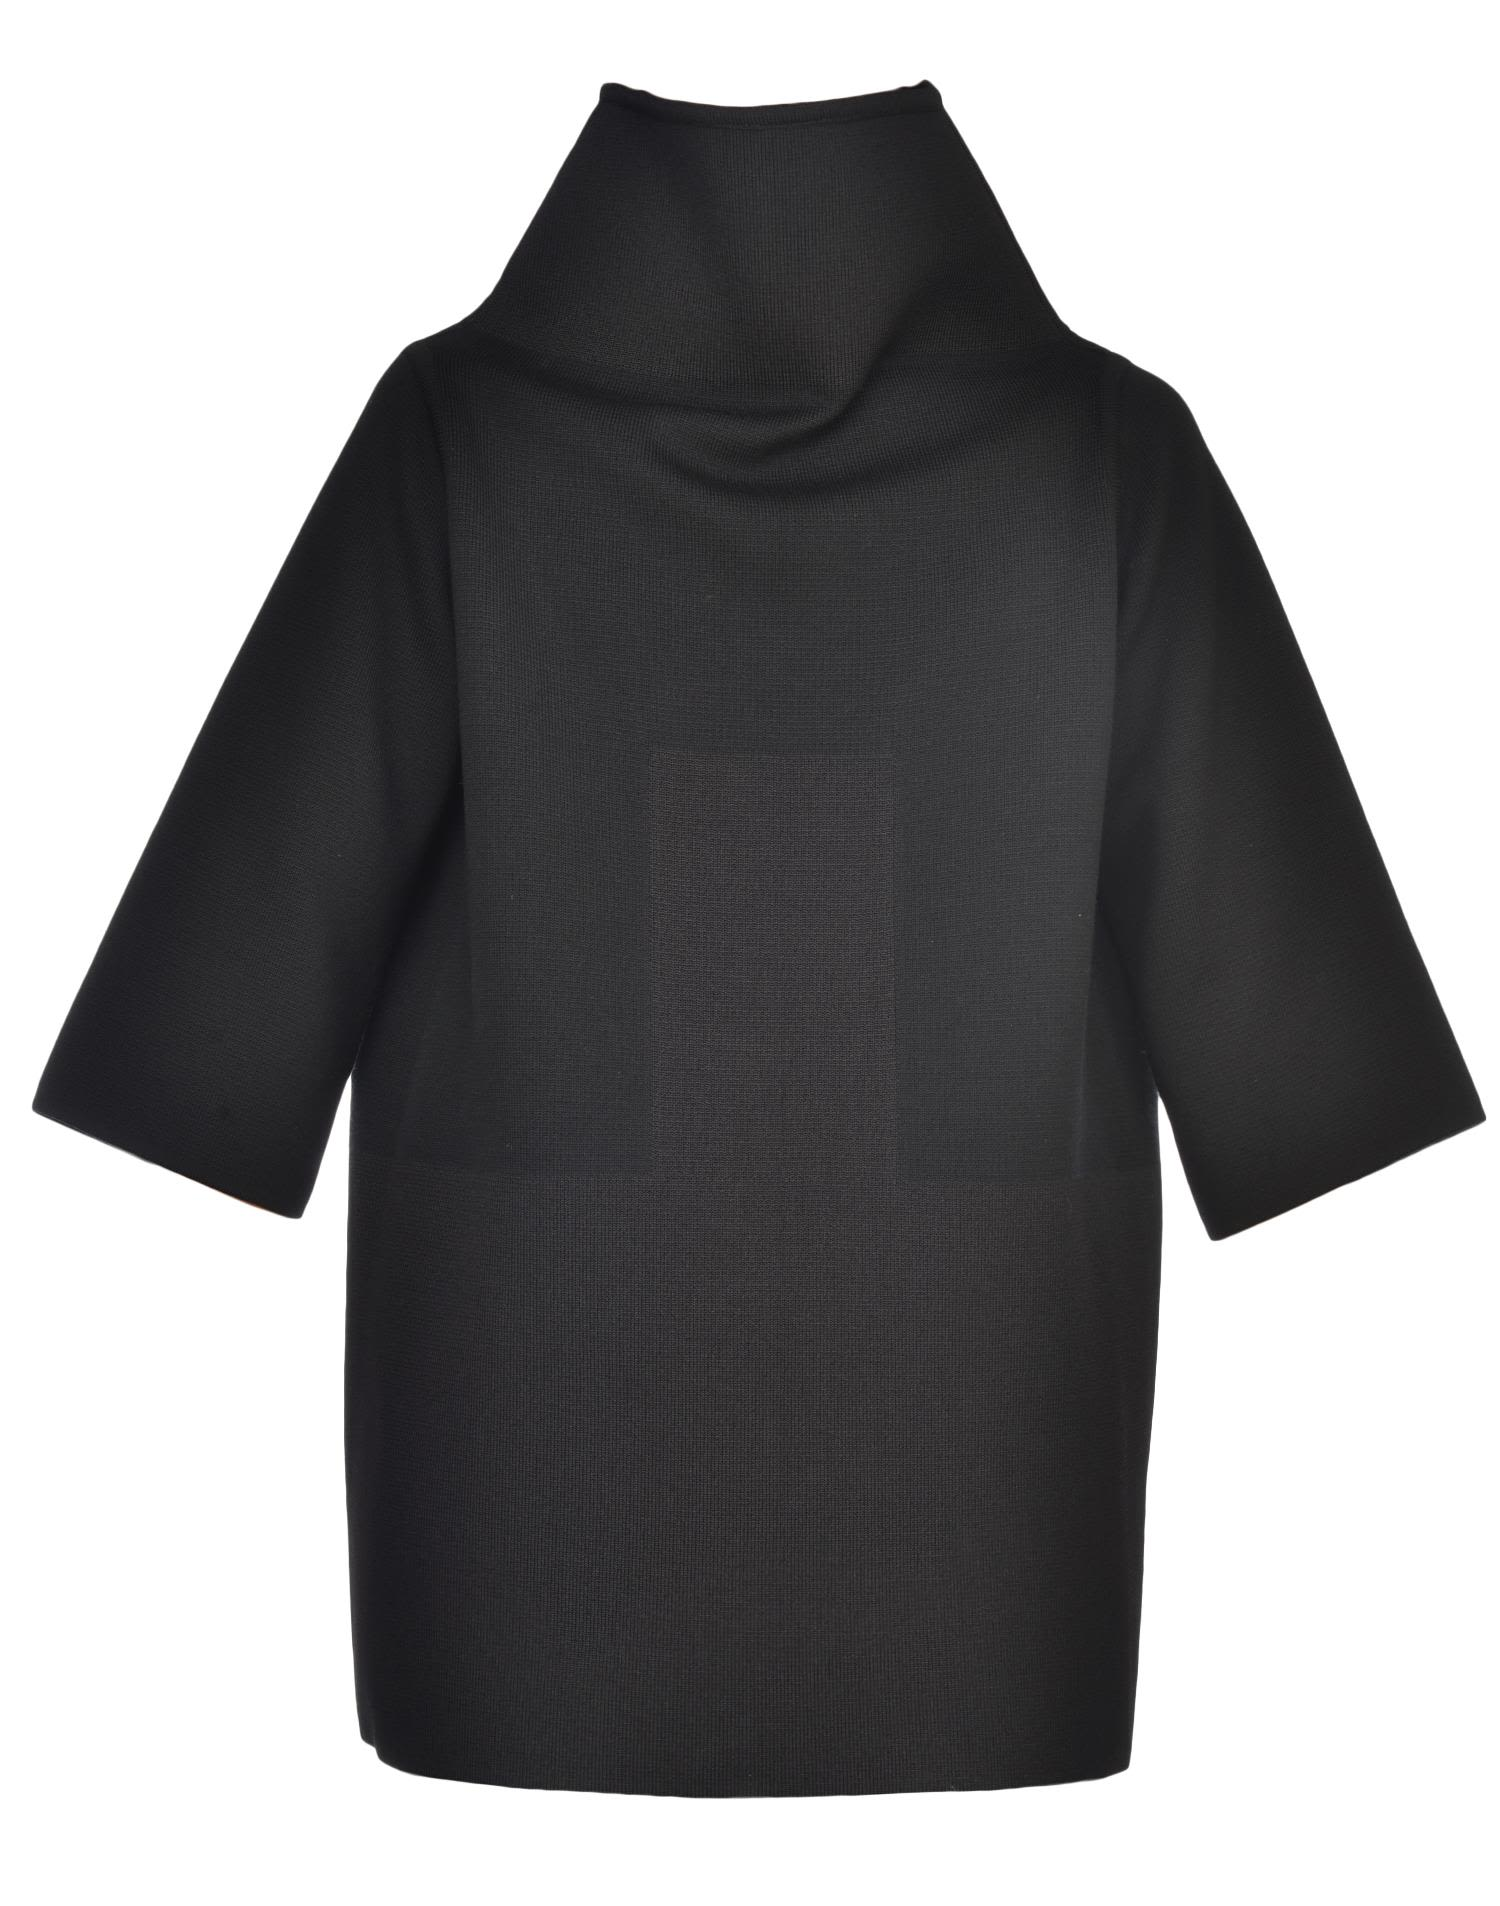 Rick Owens Wool Blend Sweater